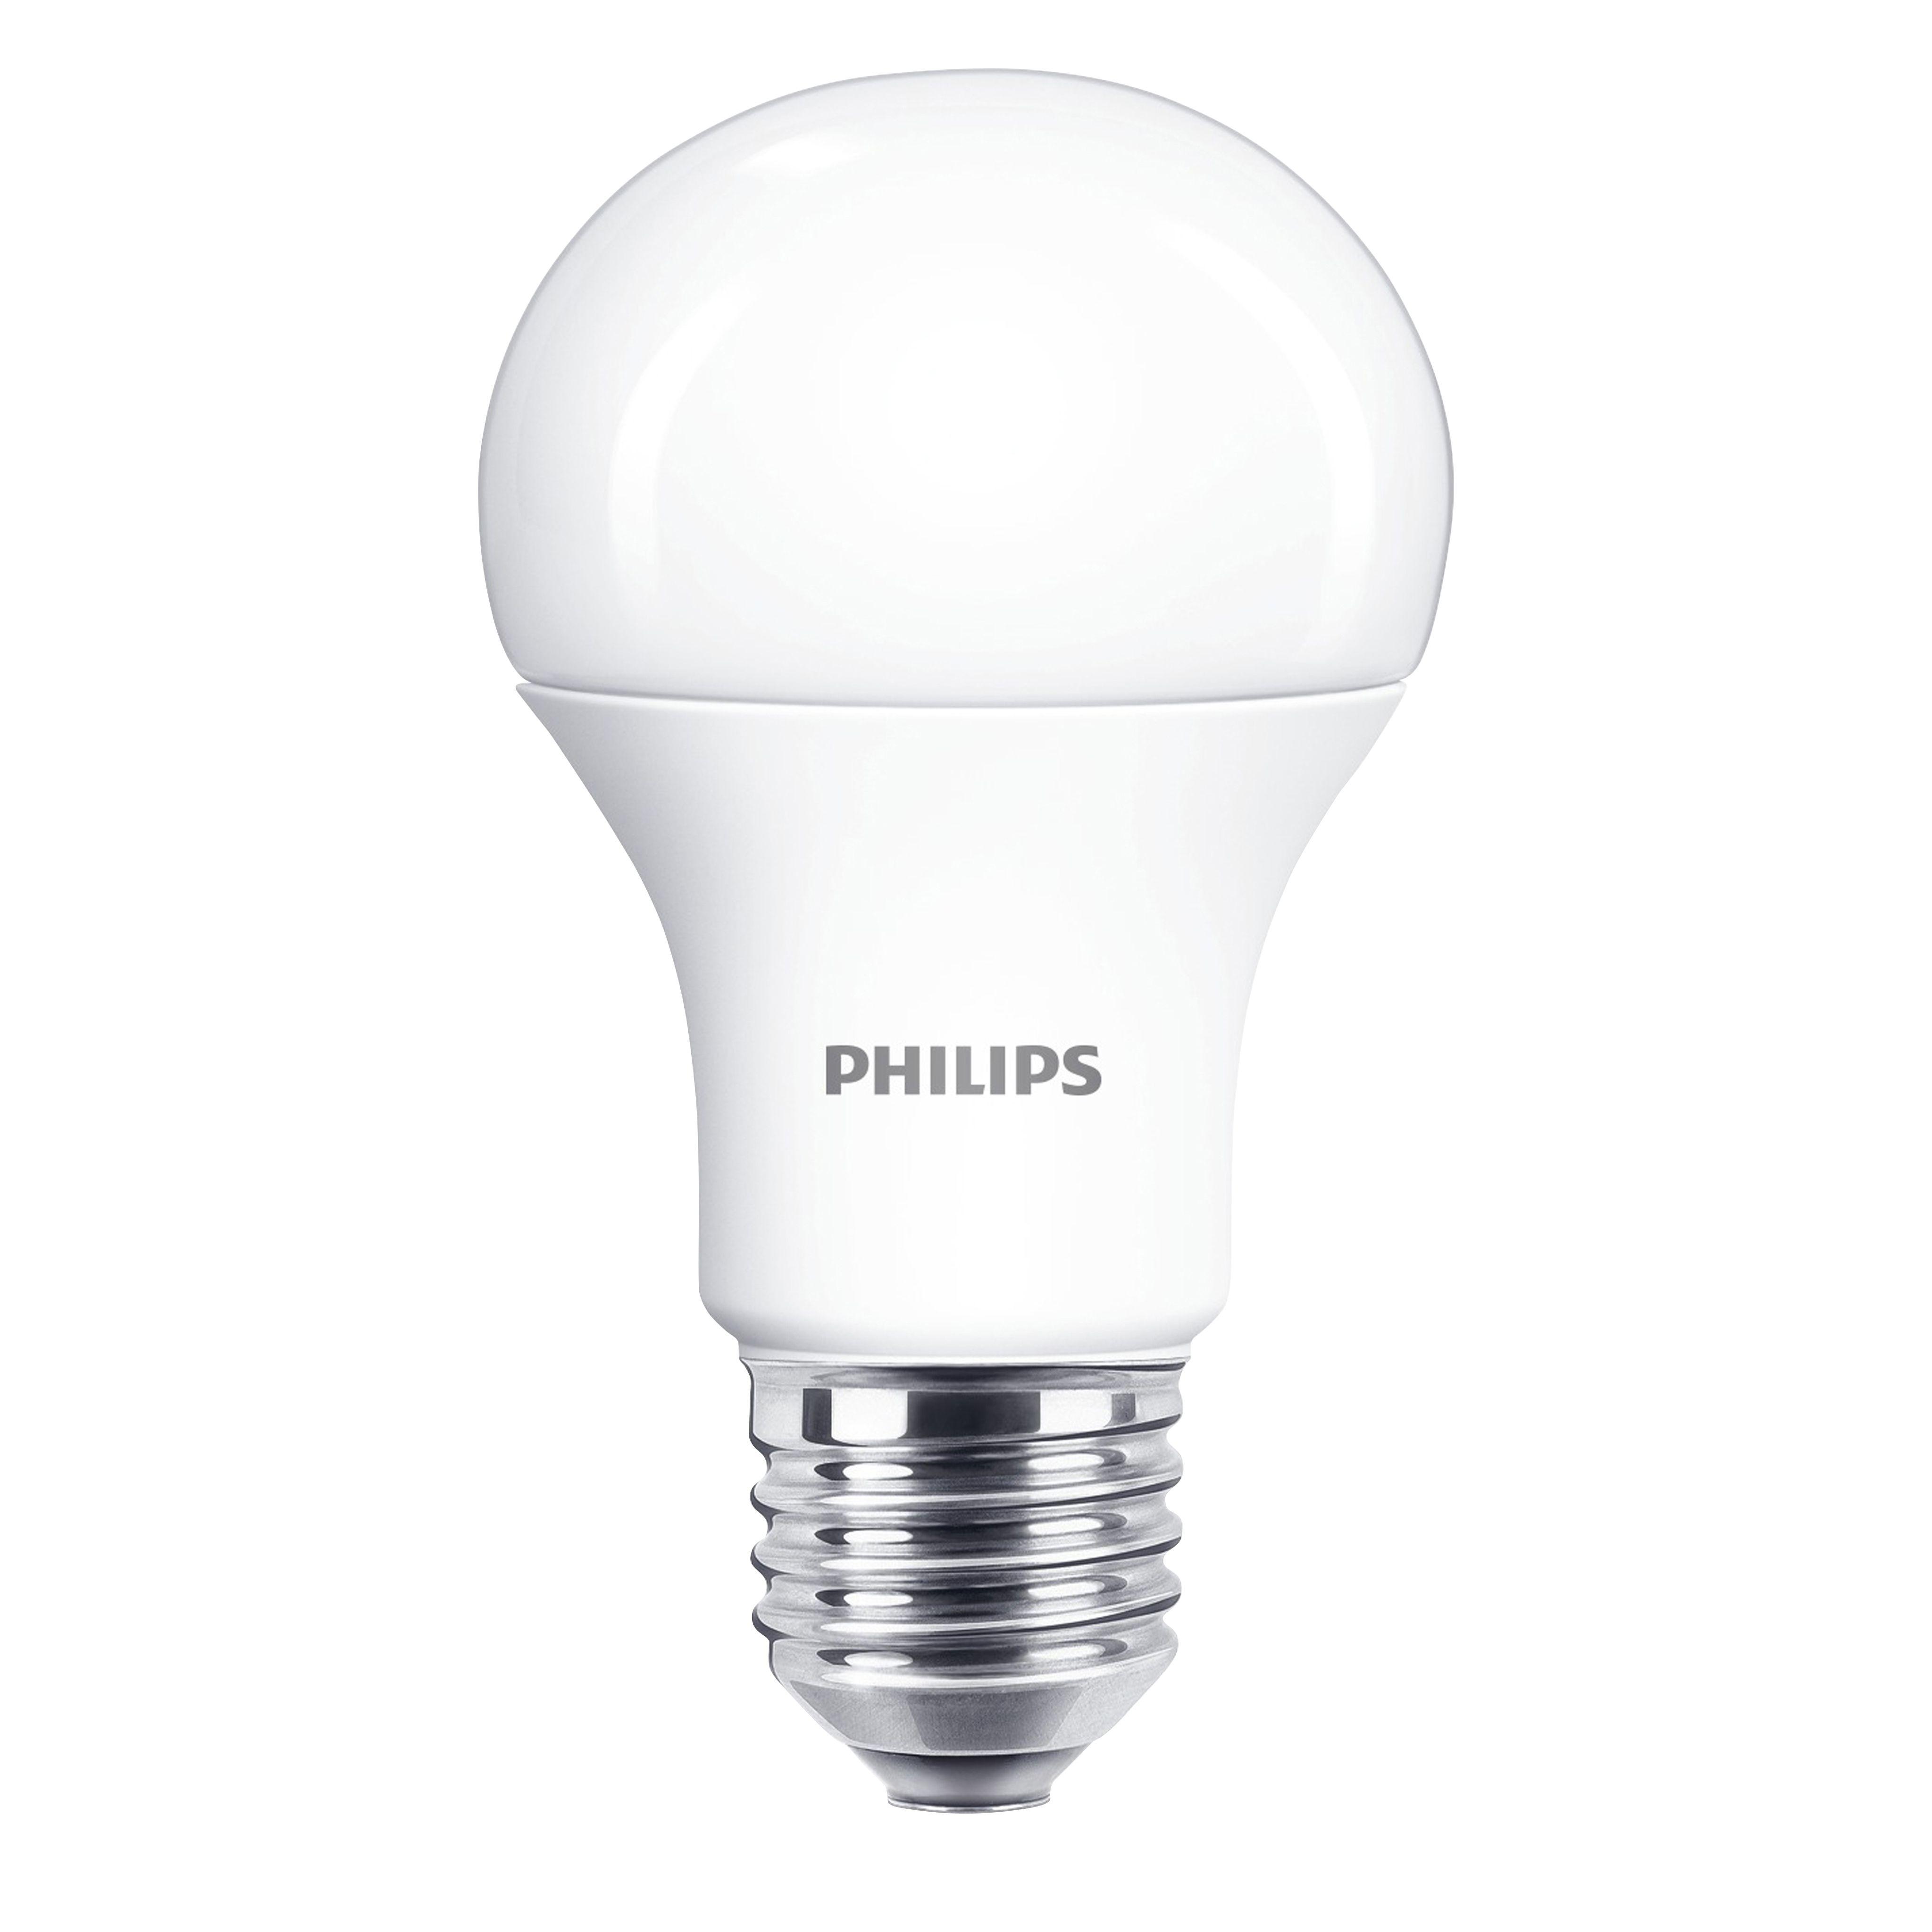 Philips E27 1521lm Led Classic Light Bulb